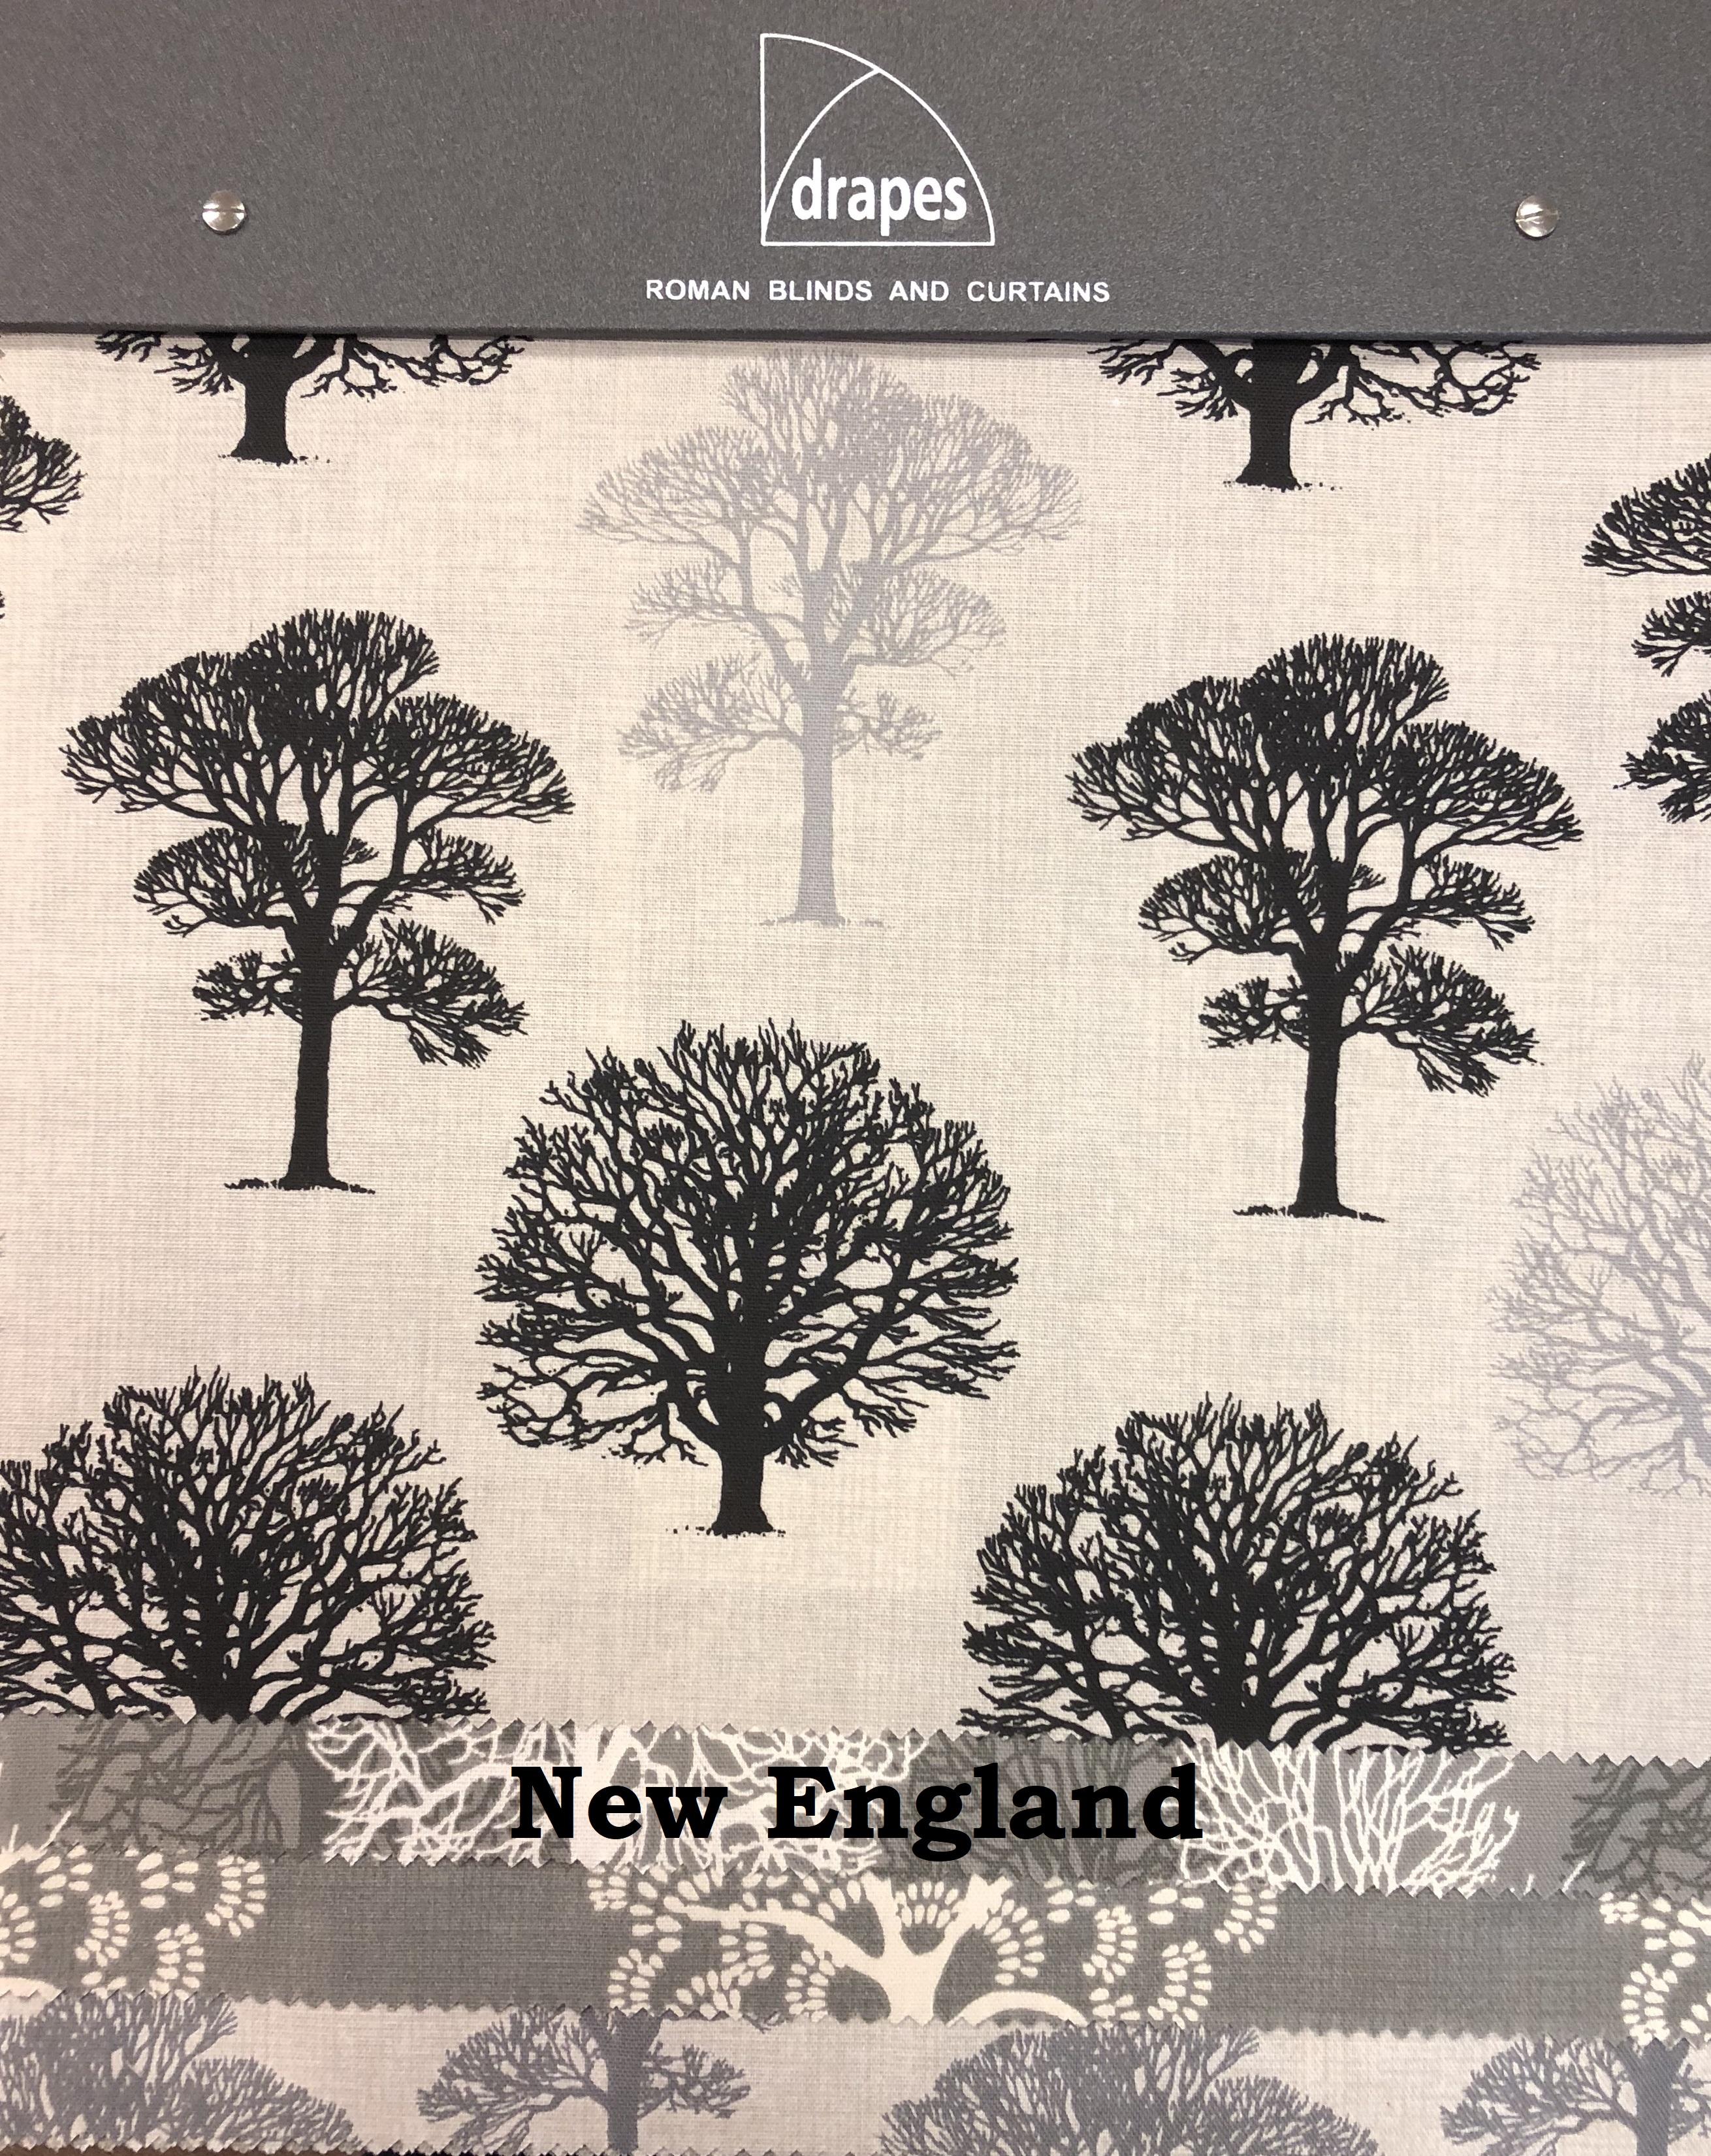 New England book